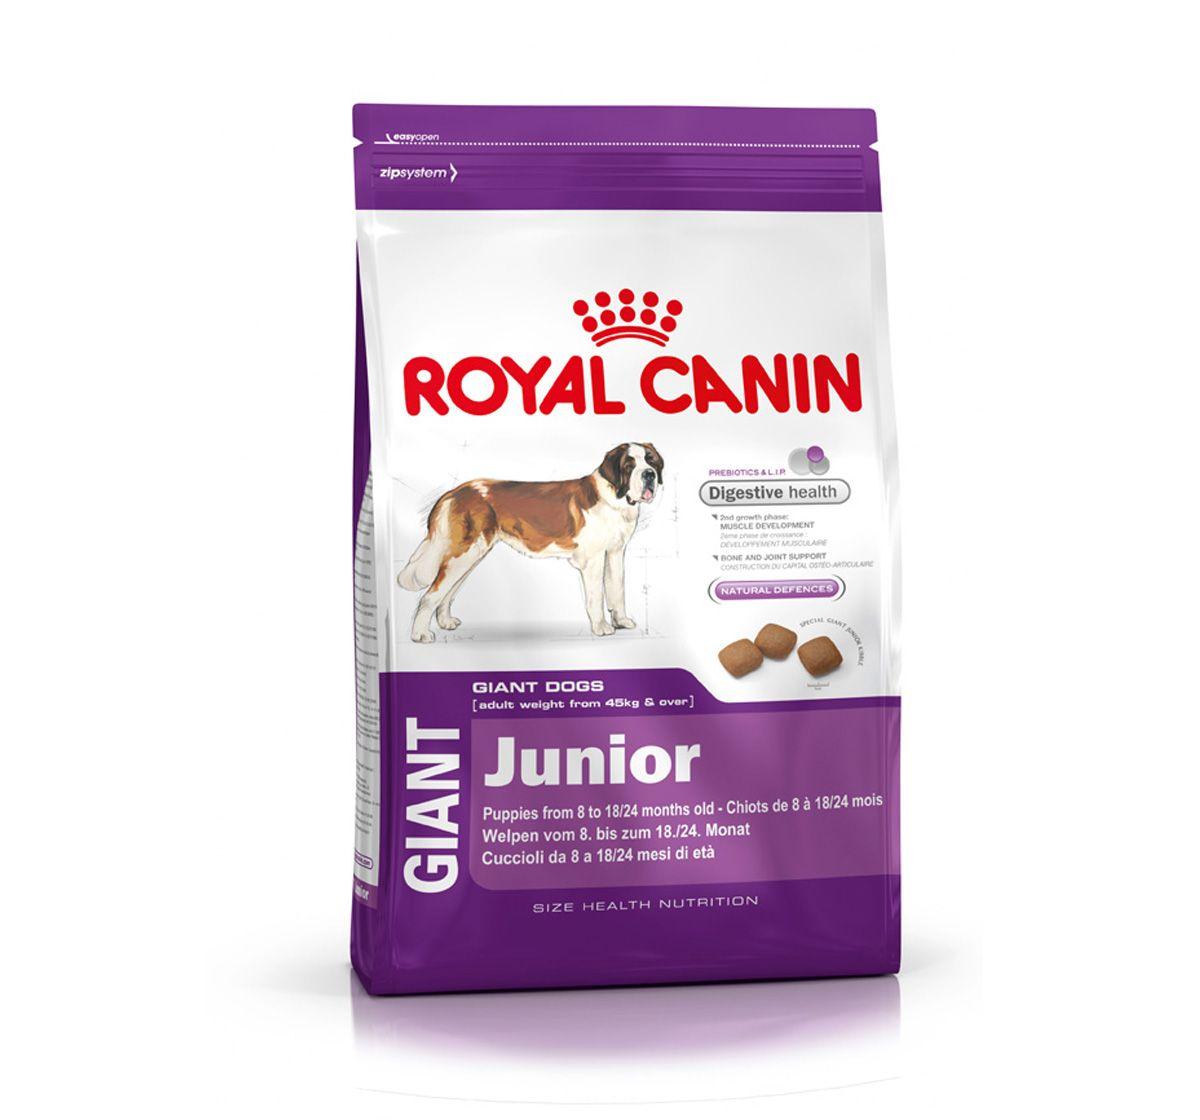 Royal Canin Giant Junior 3 5 Kg Royal Canin Dog Food Dog Food Online Royal Canin